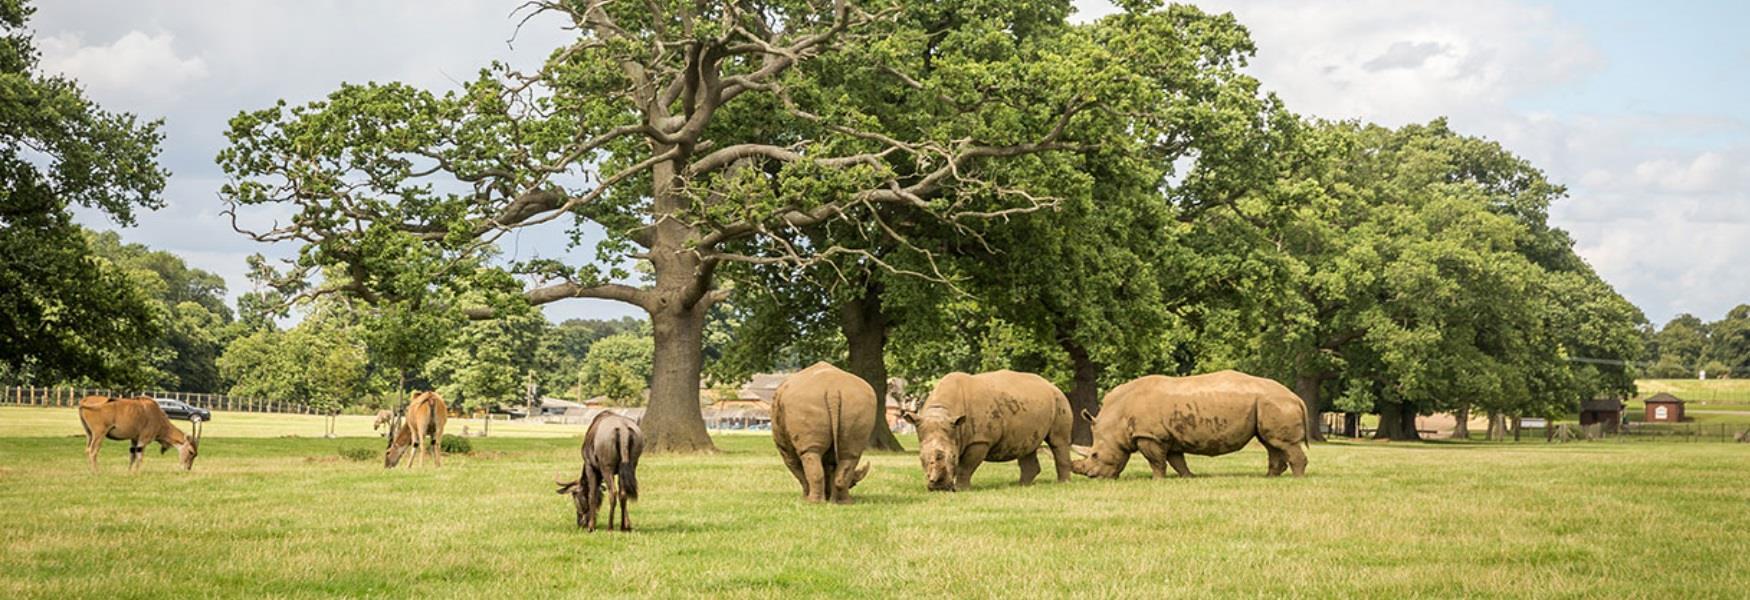 Explore Woburn Safari Park